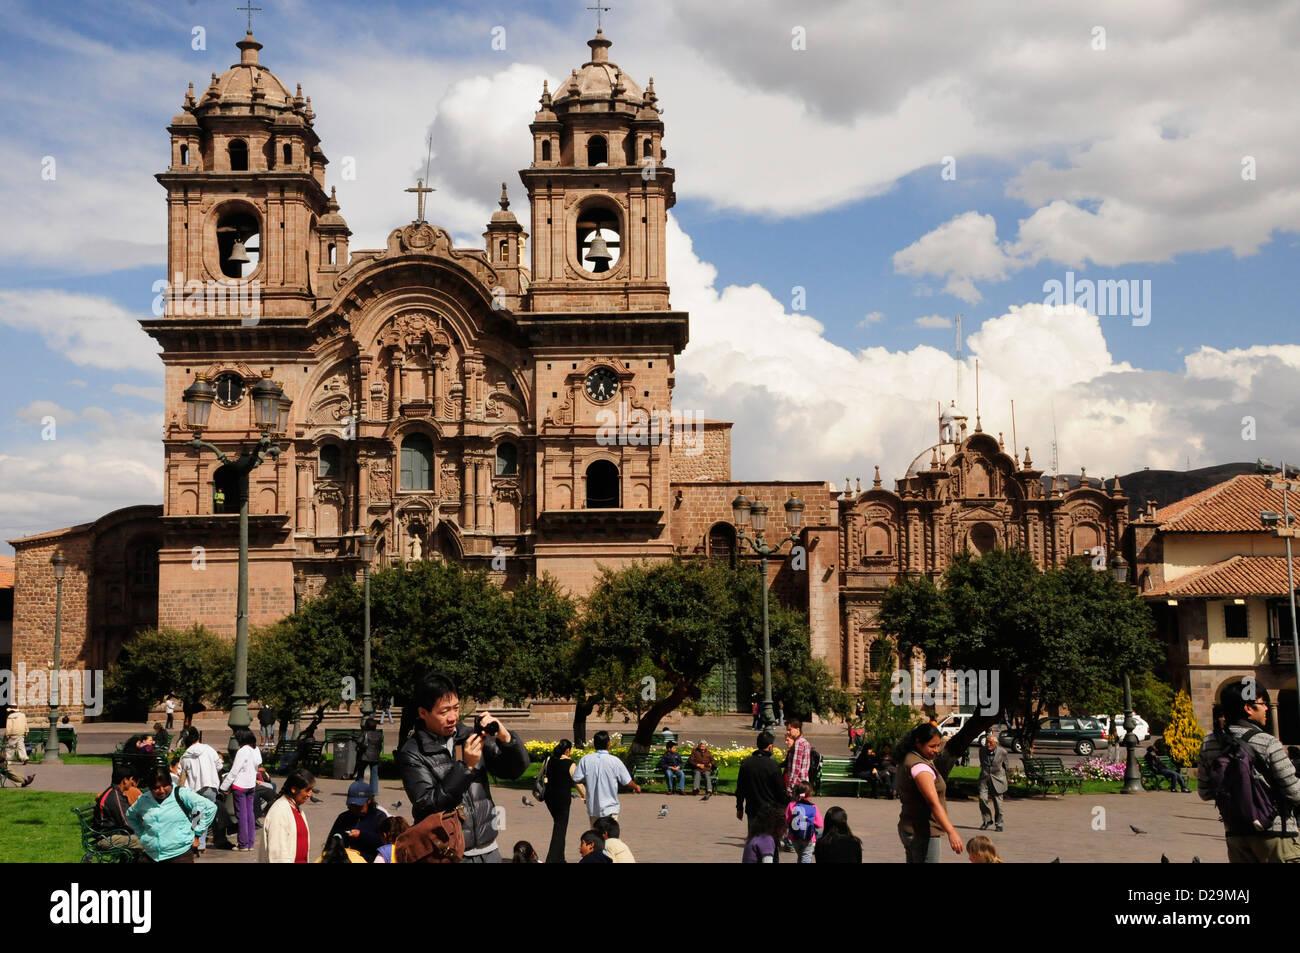 Church Of Company Of Jesus, Cuzco, Peru - Stock Image